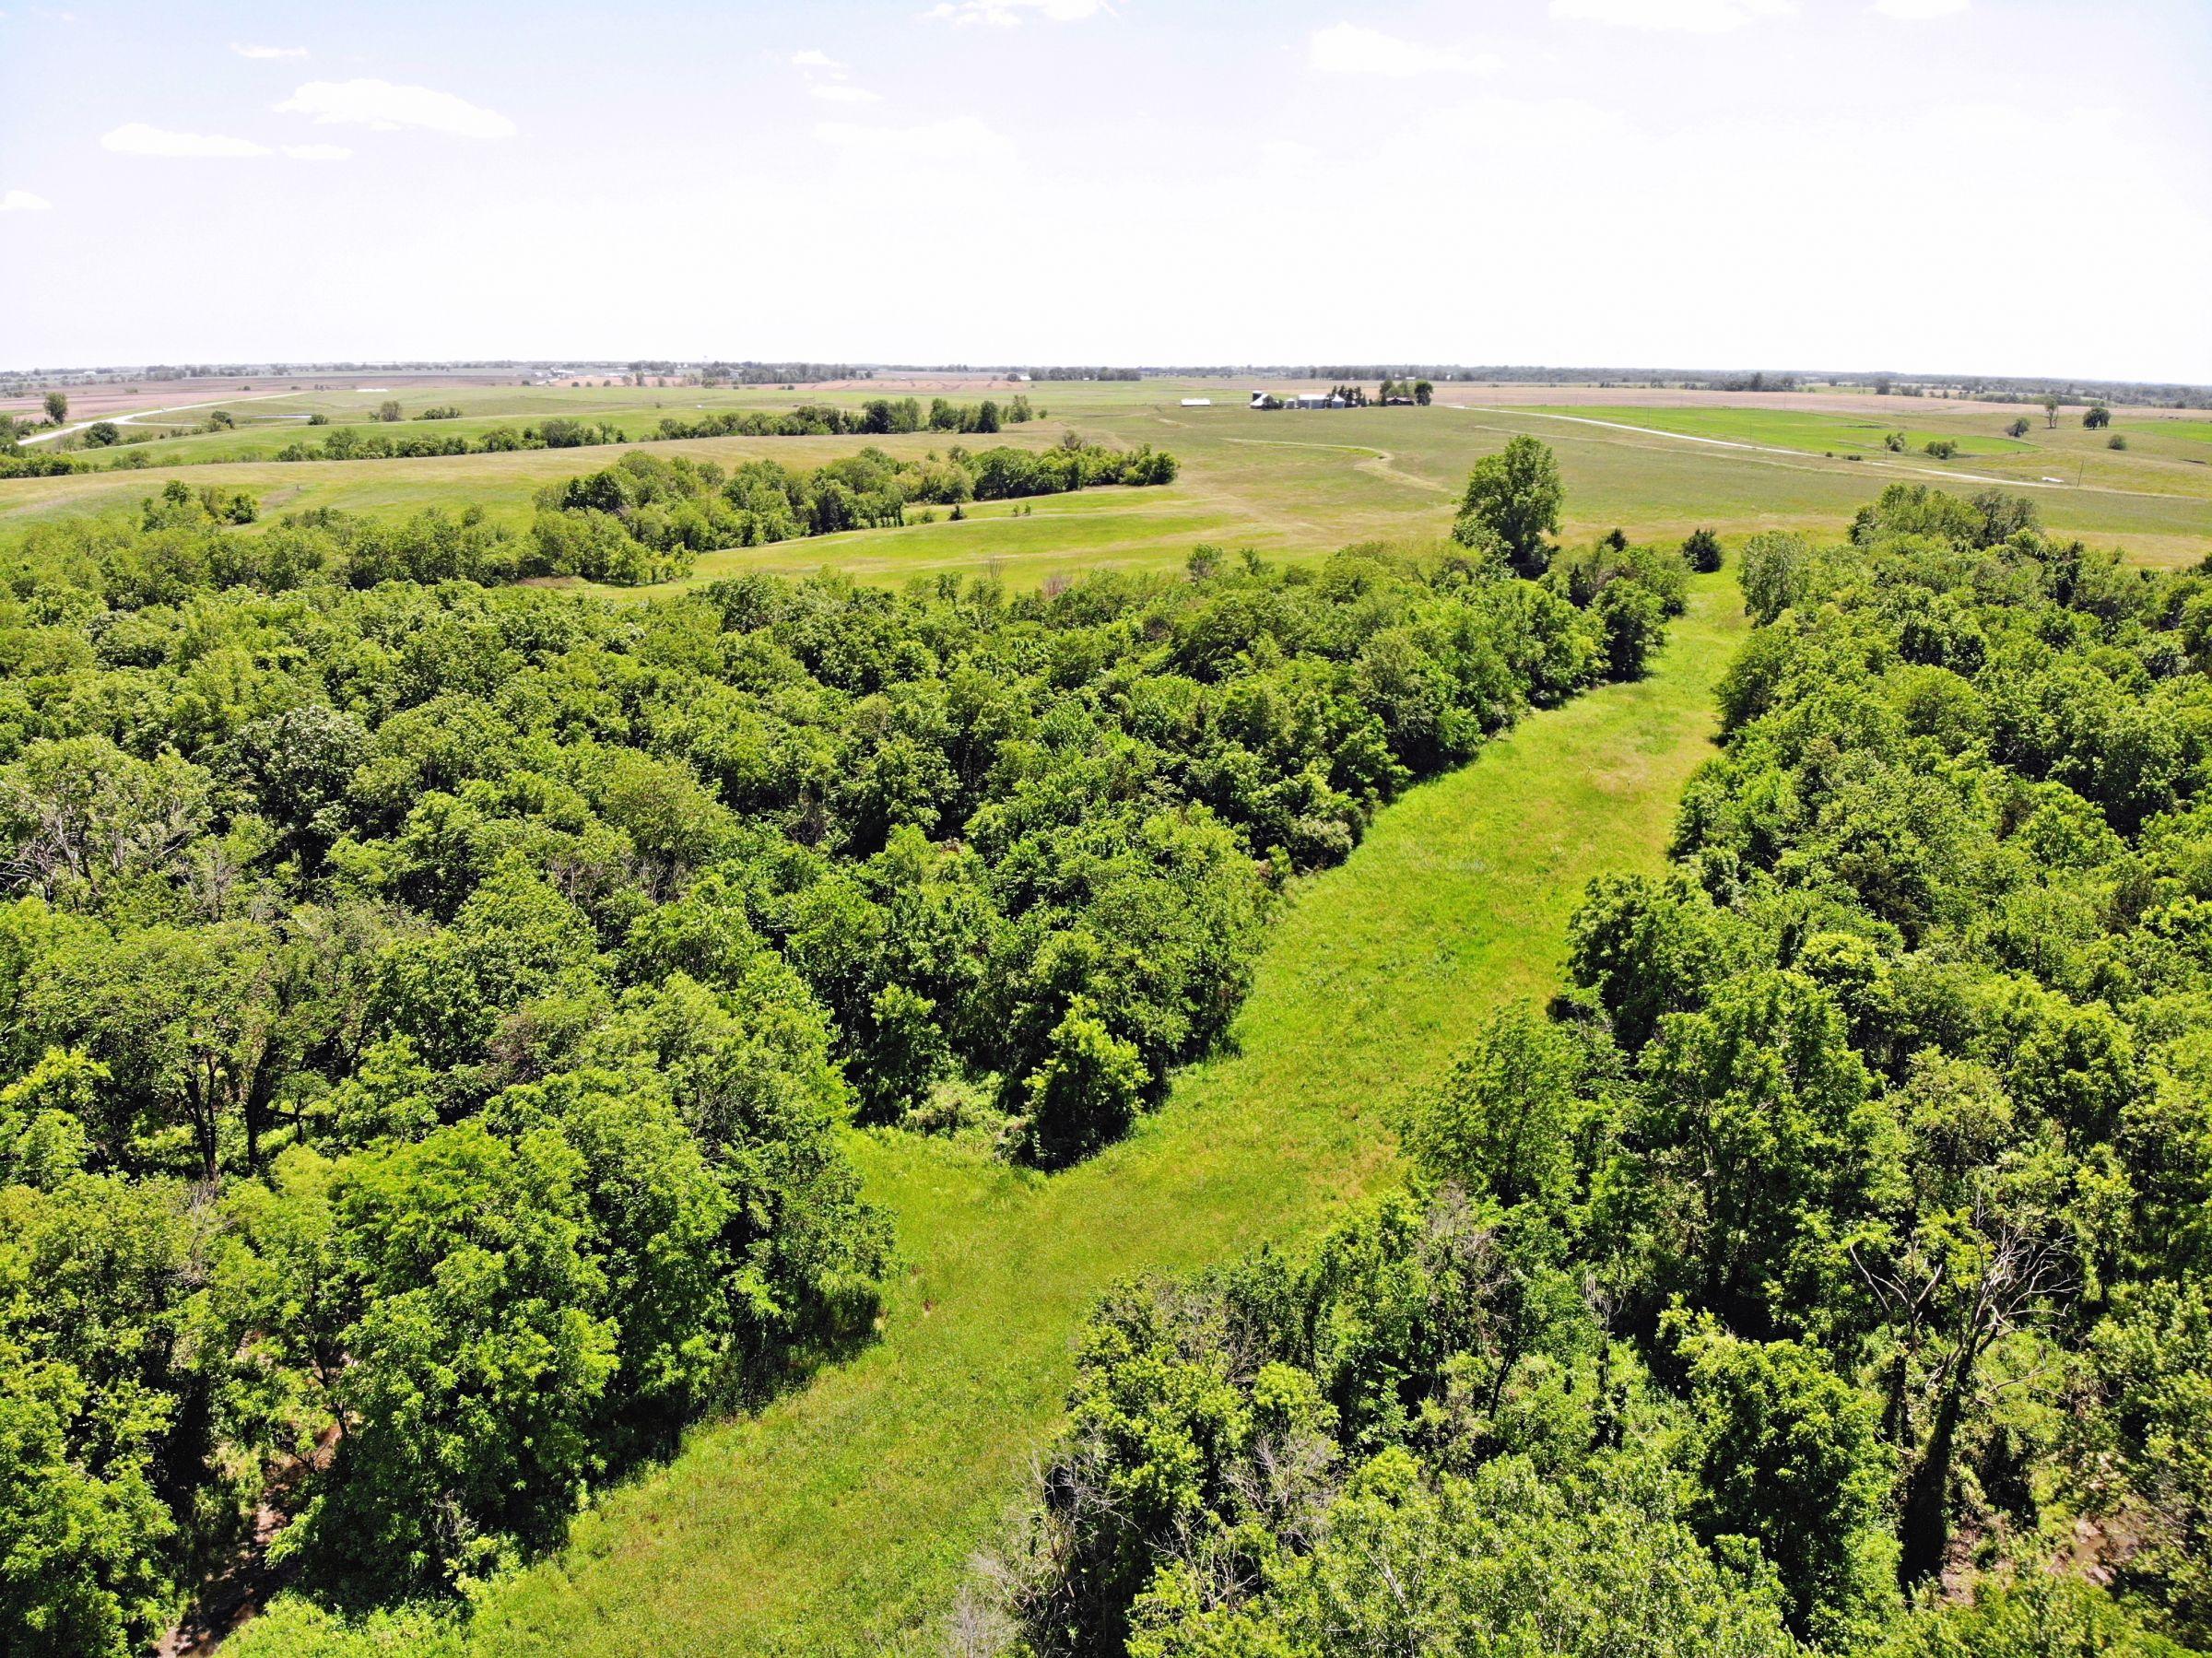 14497-78-acres-clarke-co-ia-3-2019-06-12-155646.jpg